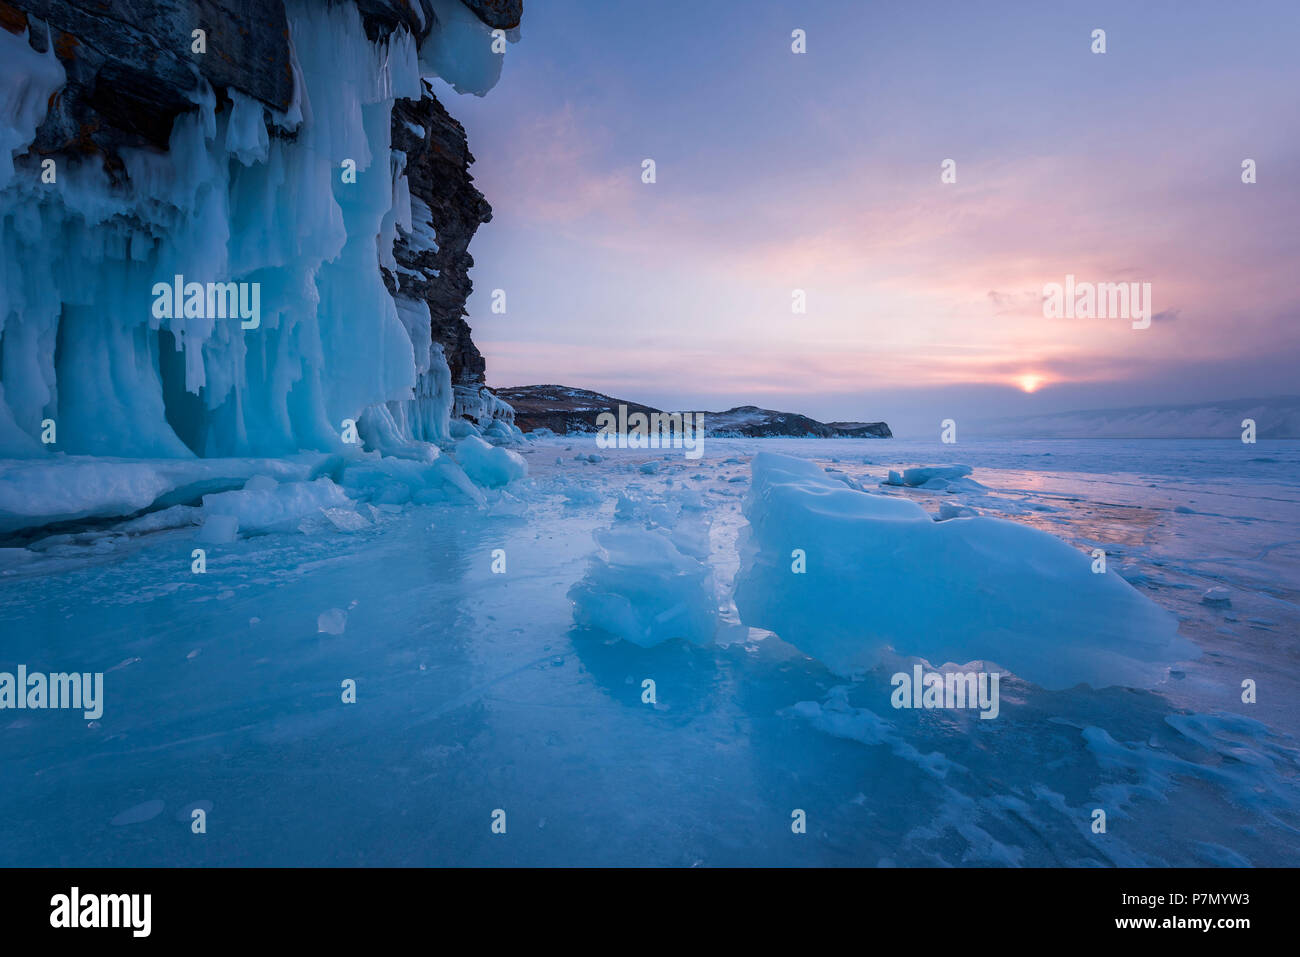 Pieces of ice at sunset at lake Baikal, Irkutsk region, Siberia, Russia - Stock Image